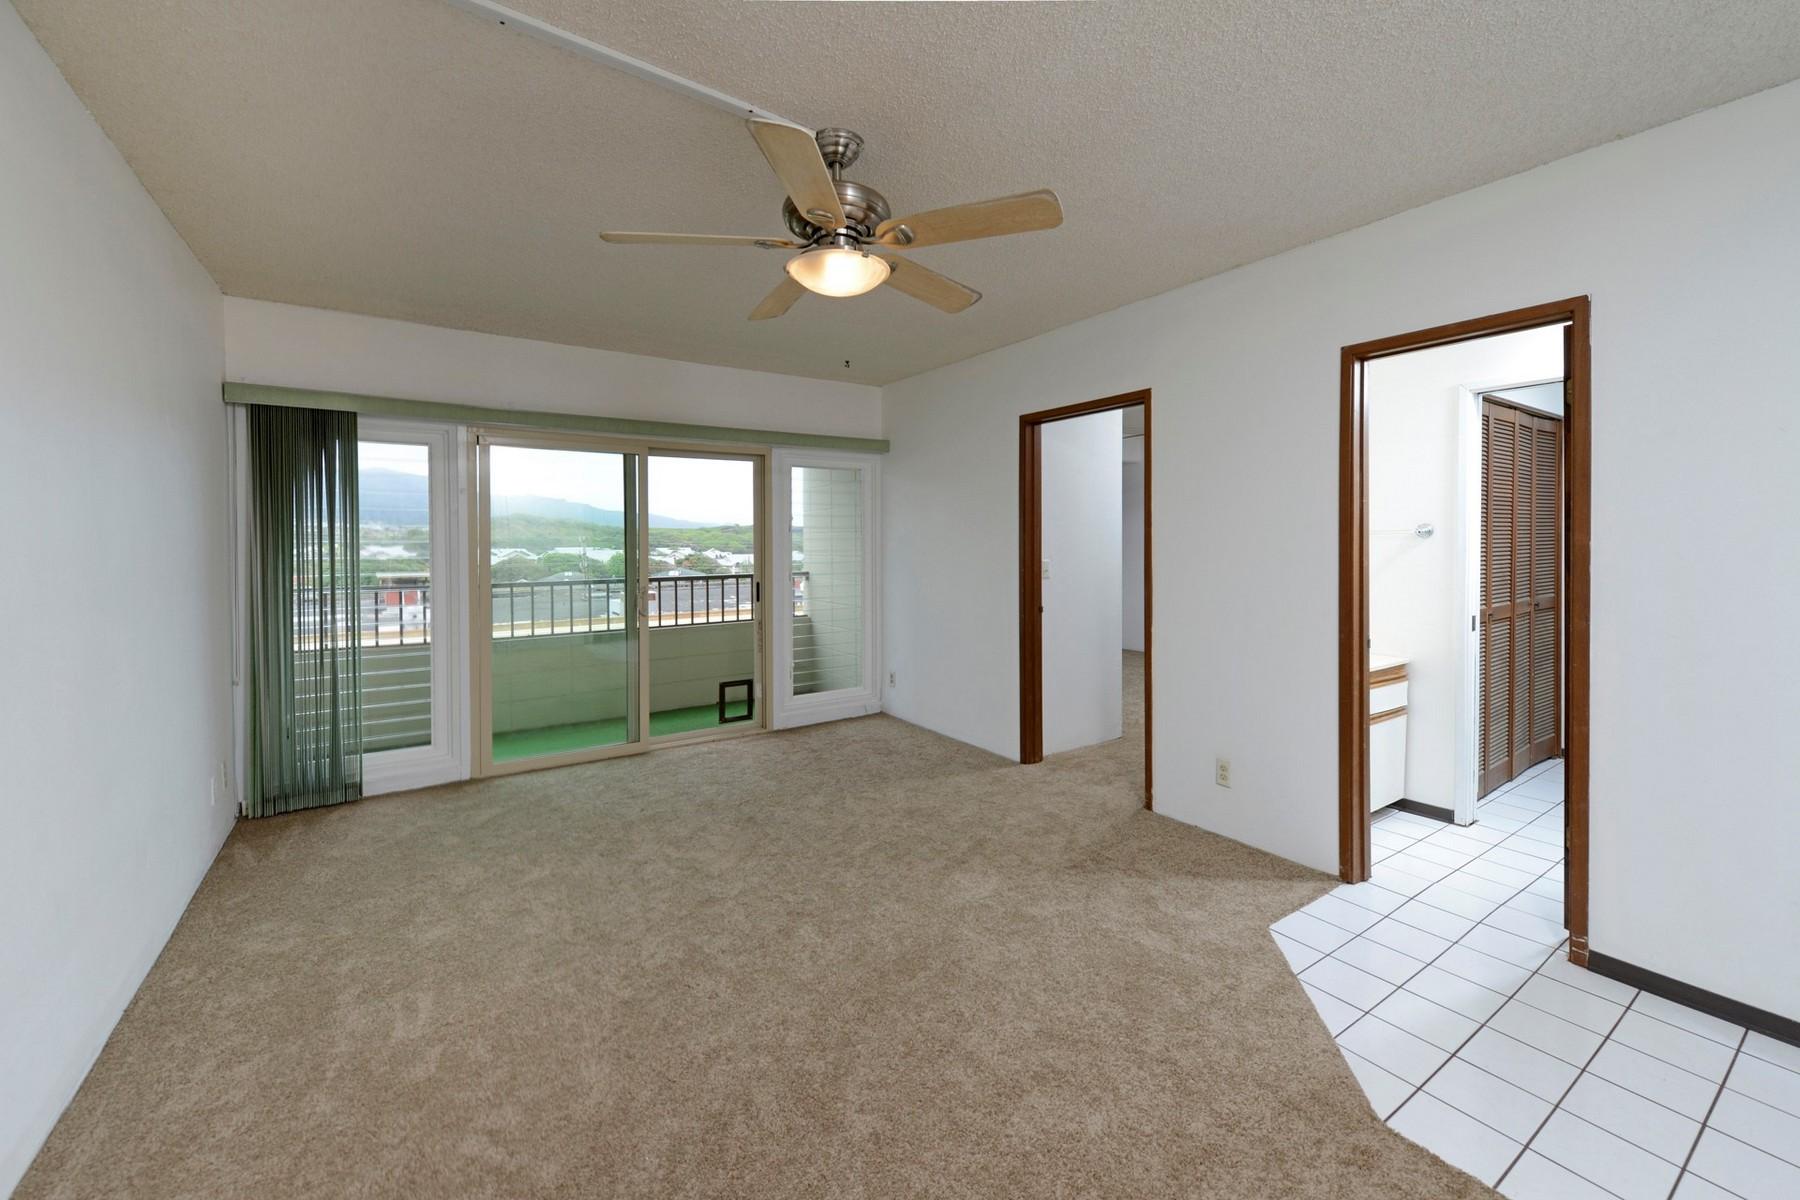 Nhà chung cư vì Bán tại Clean, Comfortable 2B/1.5B Condo Move-In Ready 1063 Lower Main Street, Puuone Towers 213 Wailuku, Hawaii, 96793 Hoa Kỳ